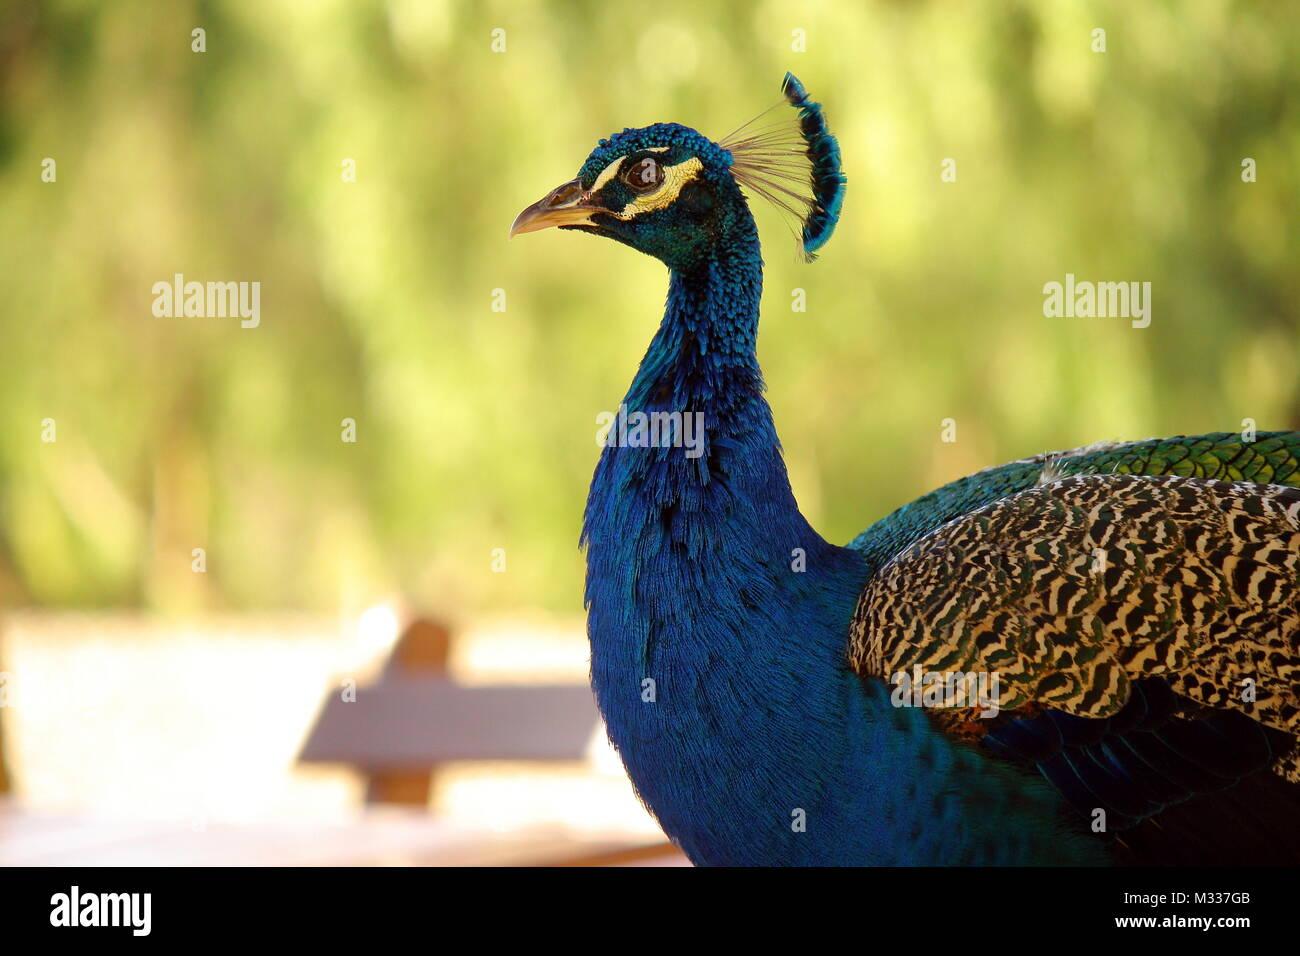 Peafowl - Stock Image